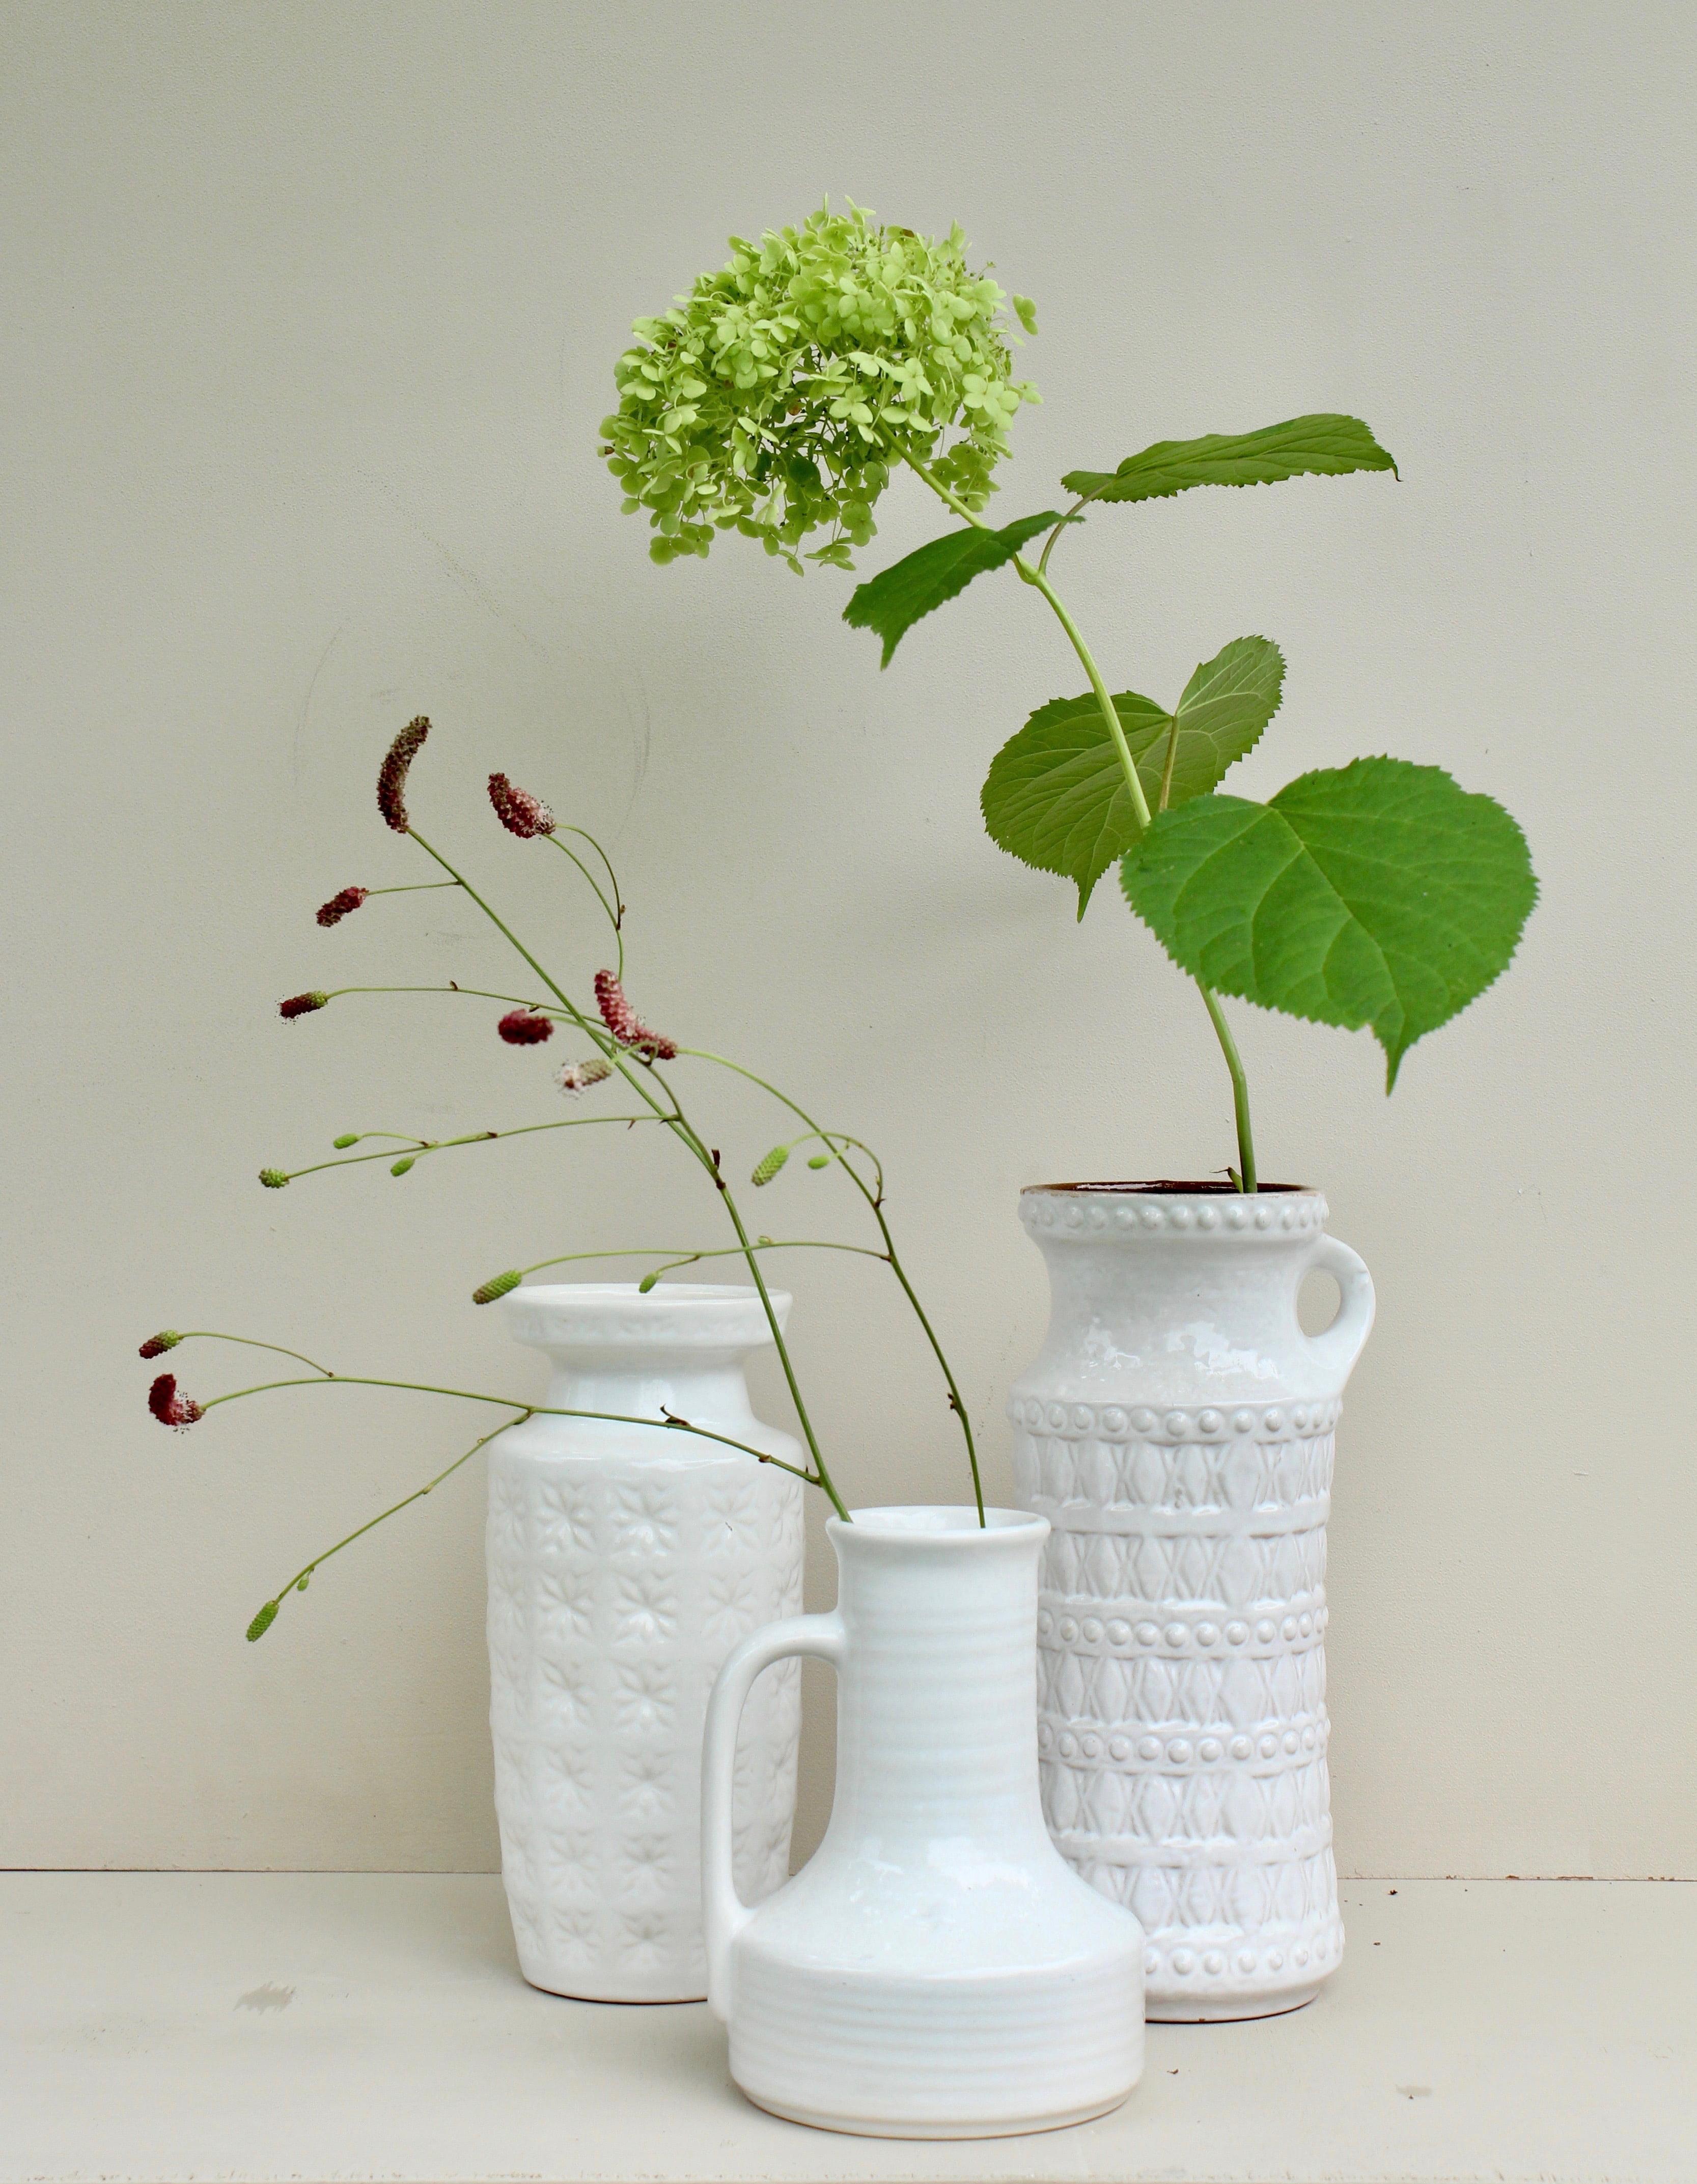 groep vintage witte vazen